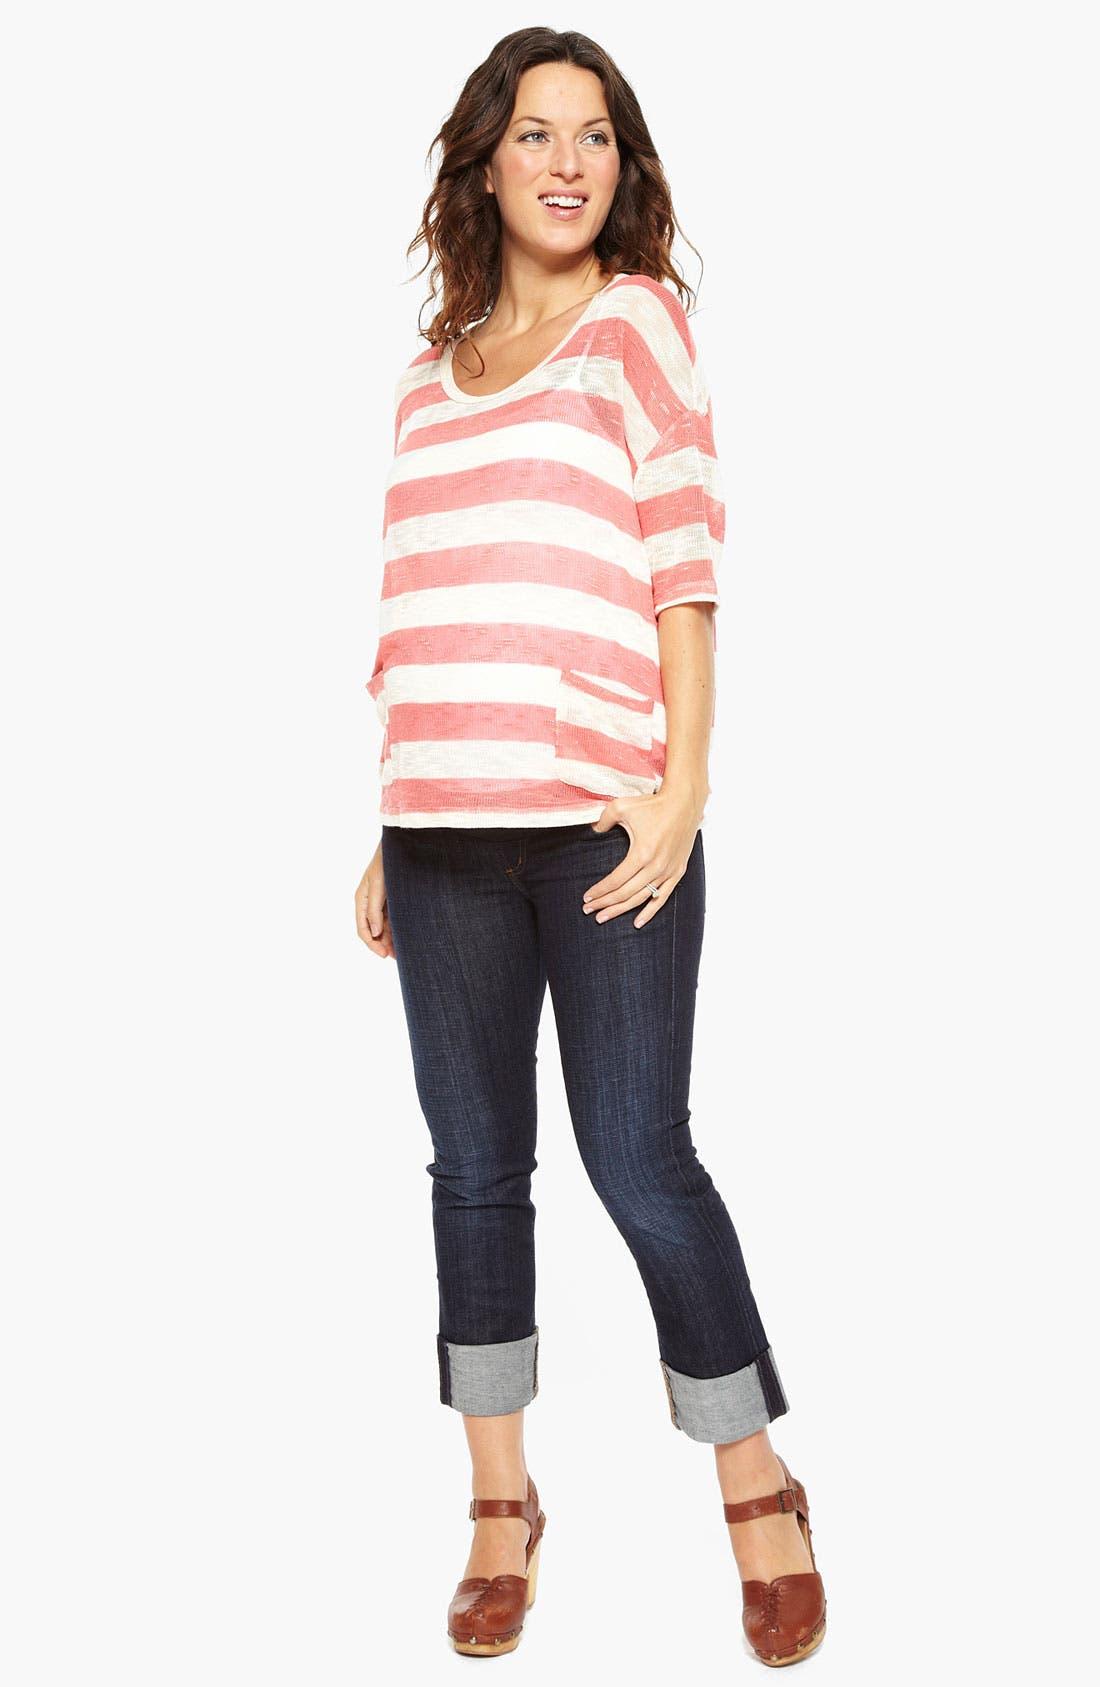 Main Image - Nom Maternity 'Hope' Maternity Boyfriend Sweater